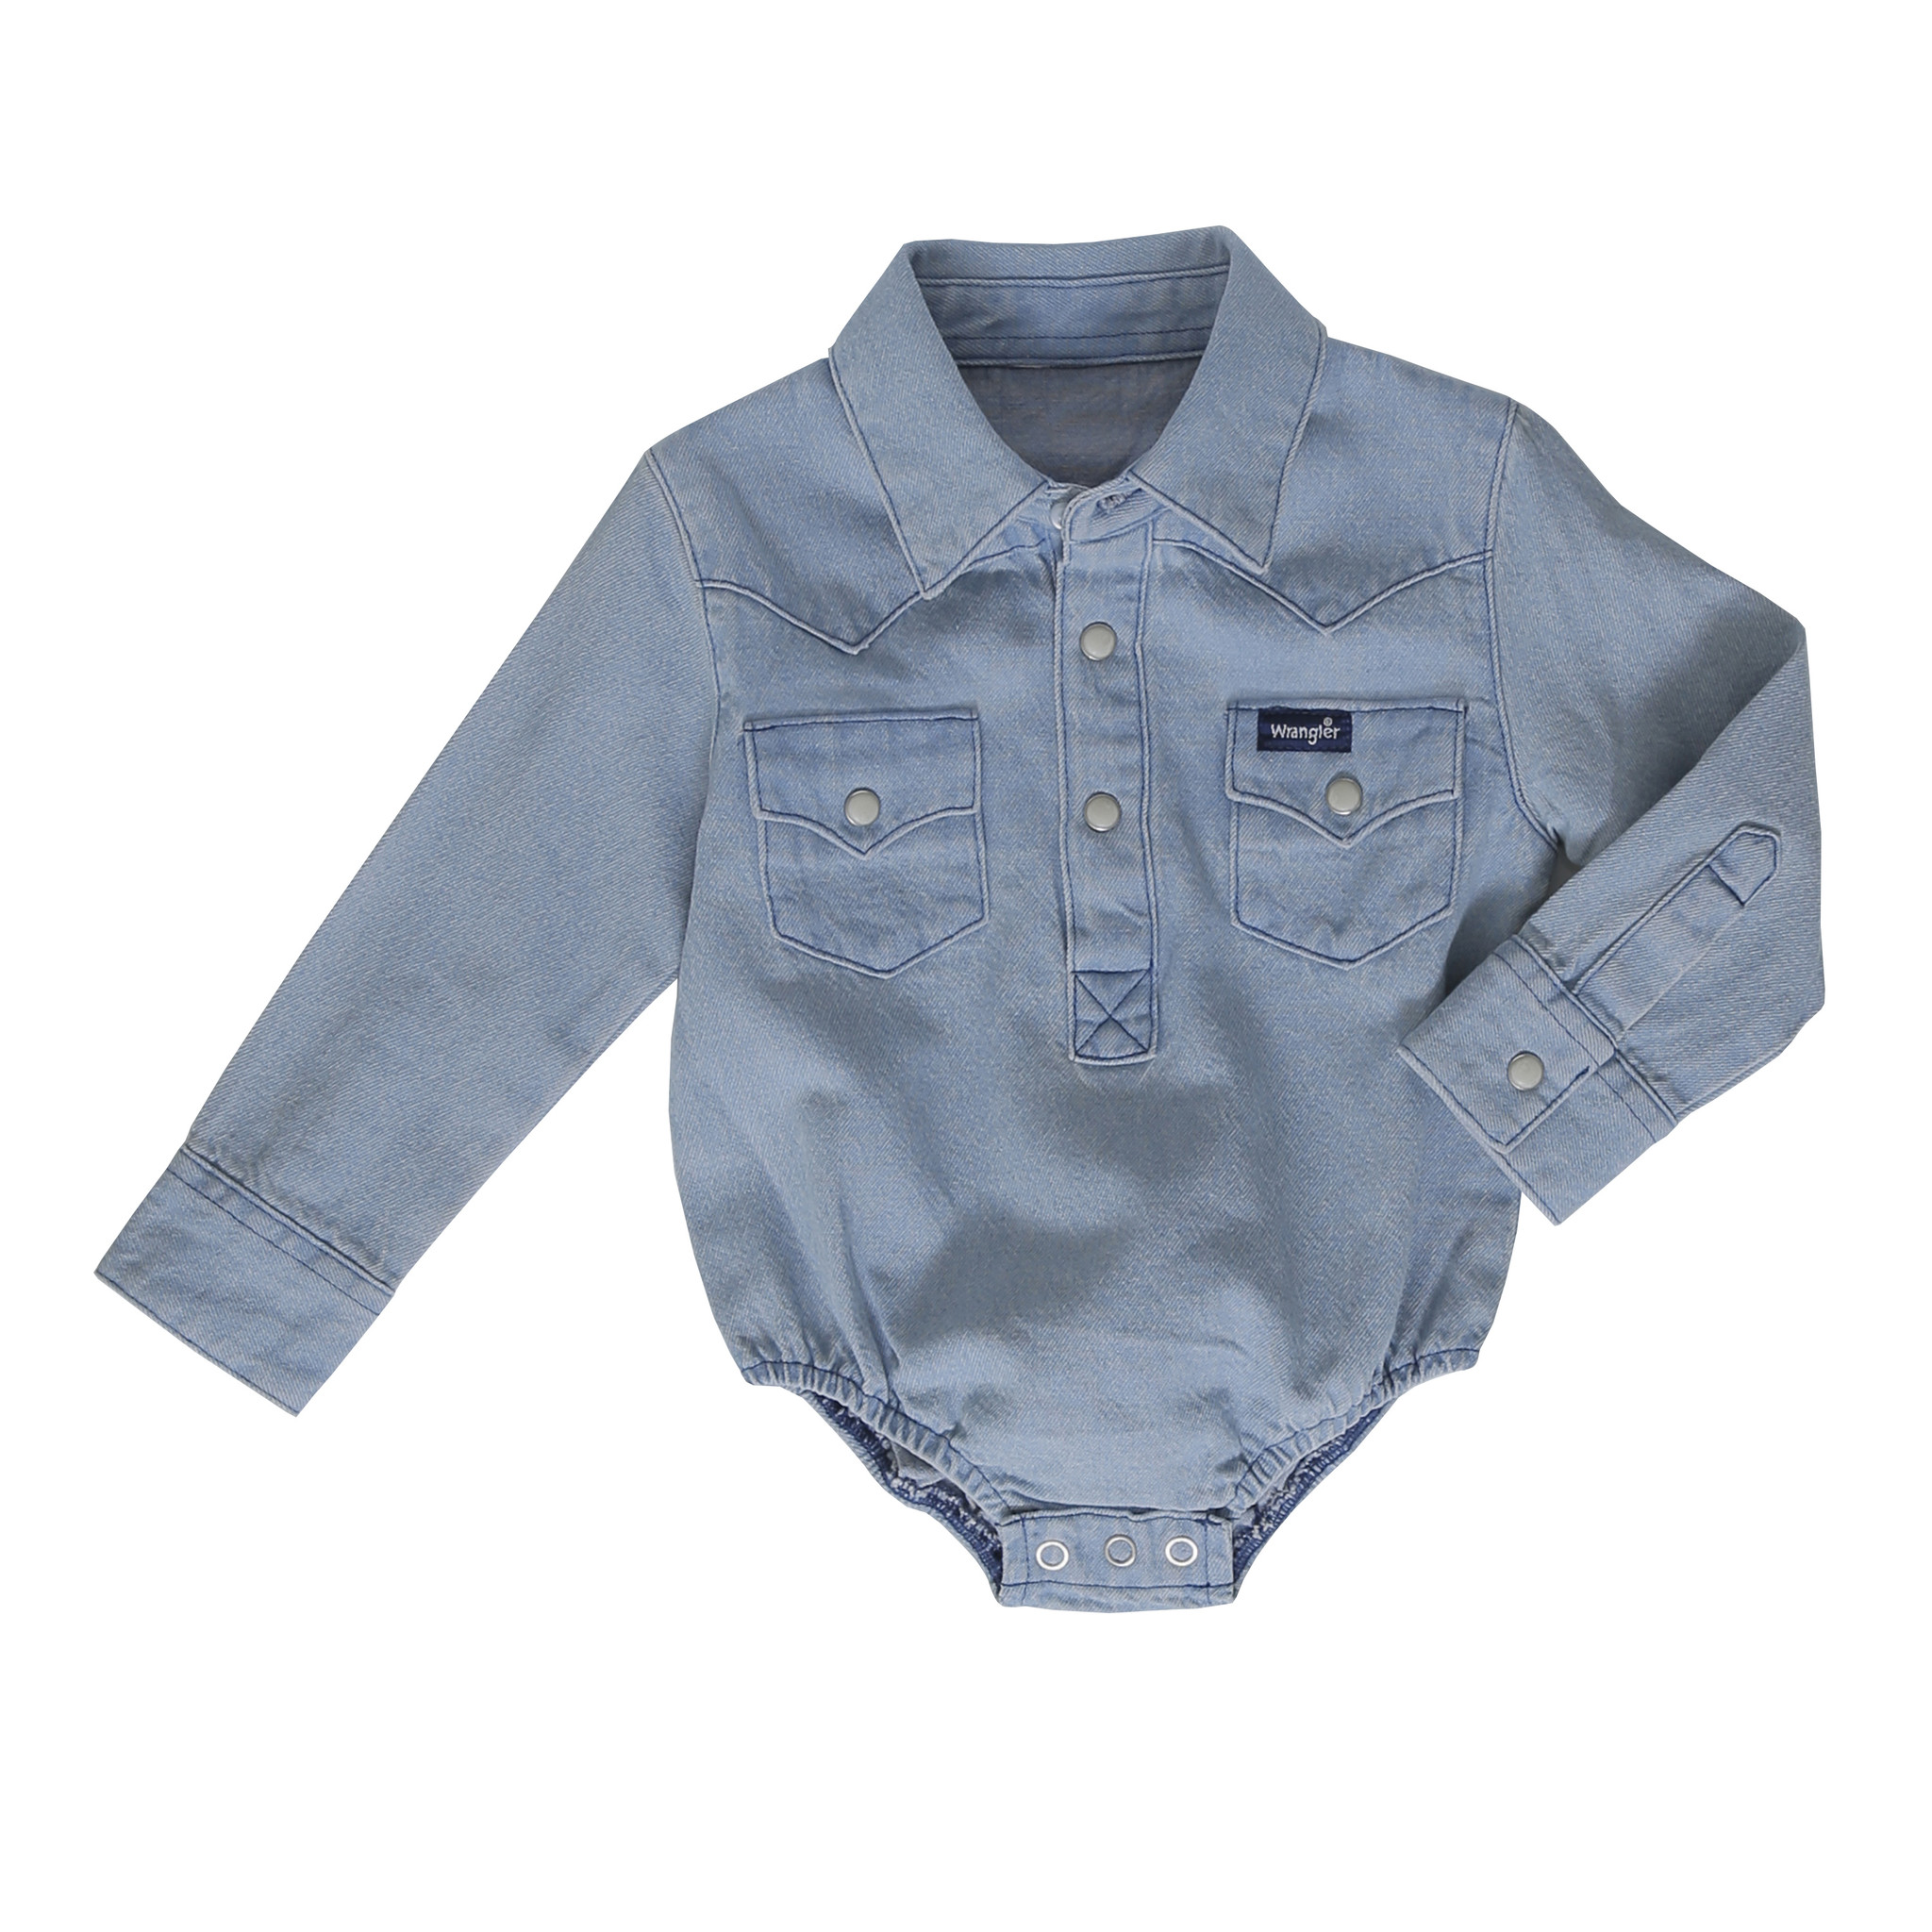 20e4c7ff Baby Wrangler Onesie, Light Denim - Chick Elms Grand Entry Western Store  and Rodeo Shop